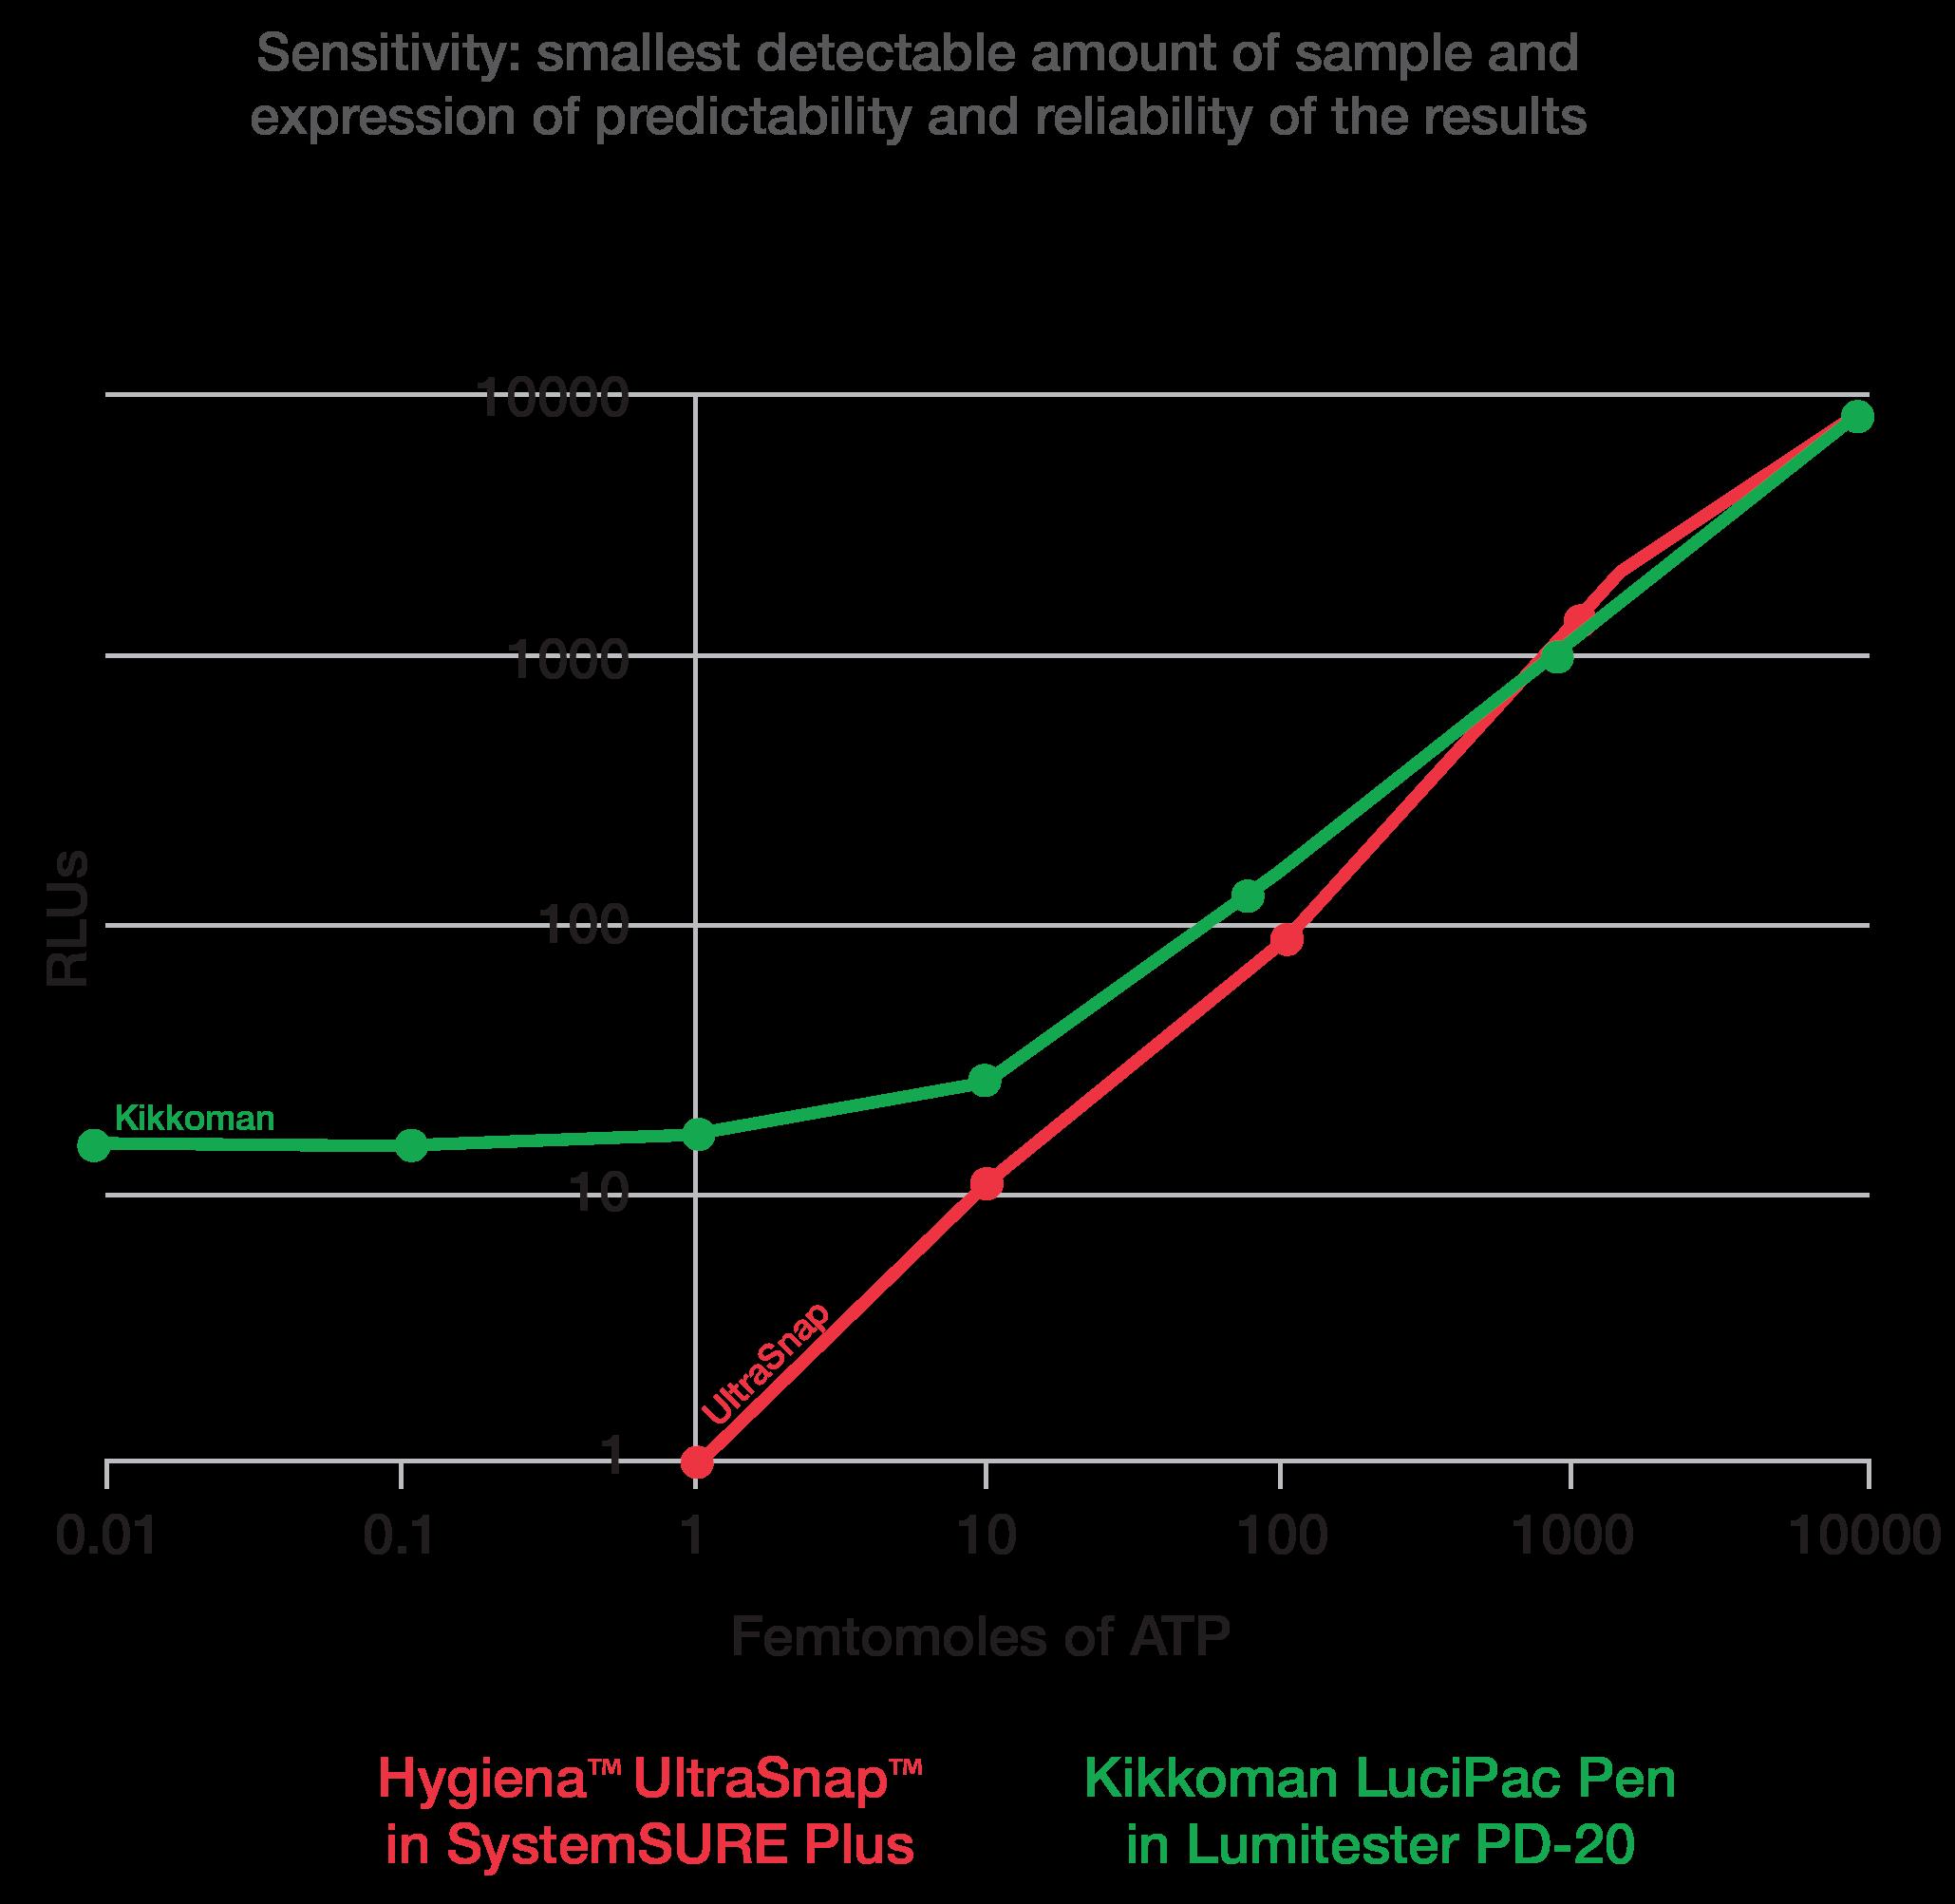 Compare Kikkoman Hygiena accuracy